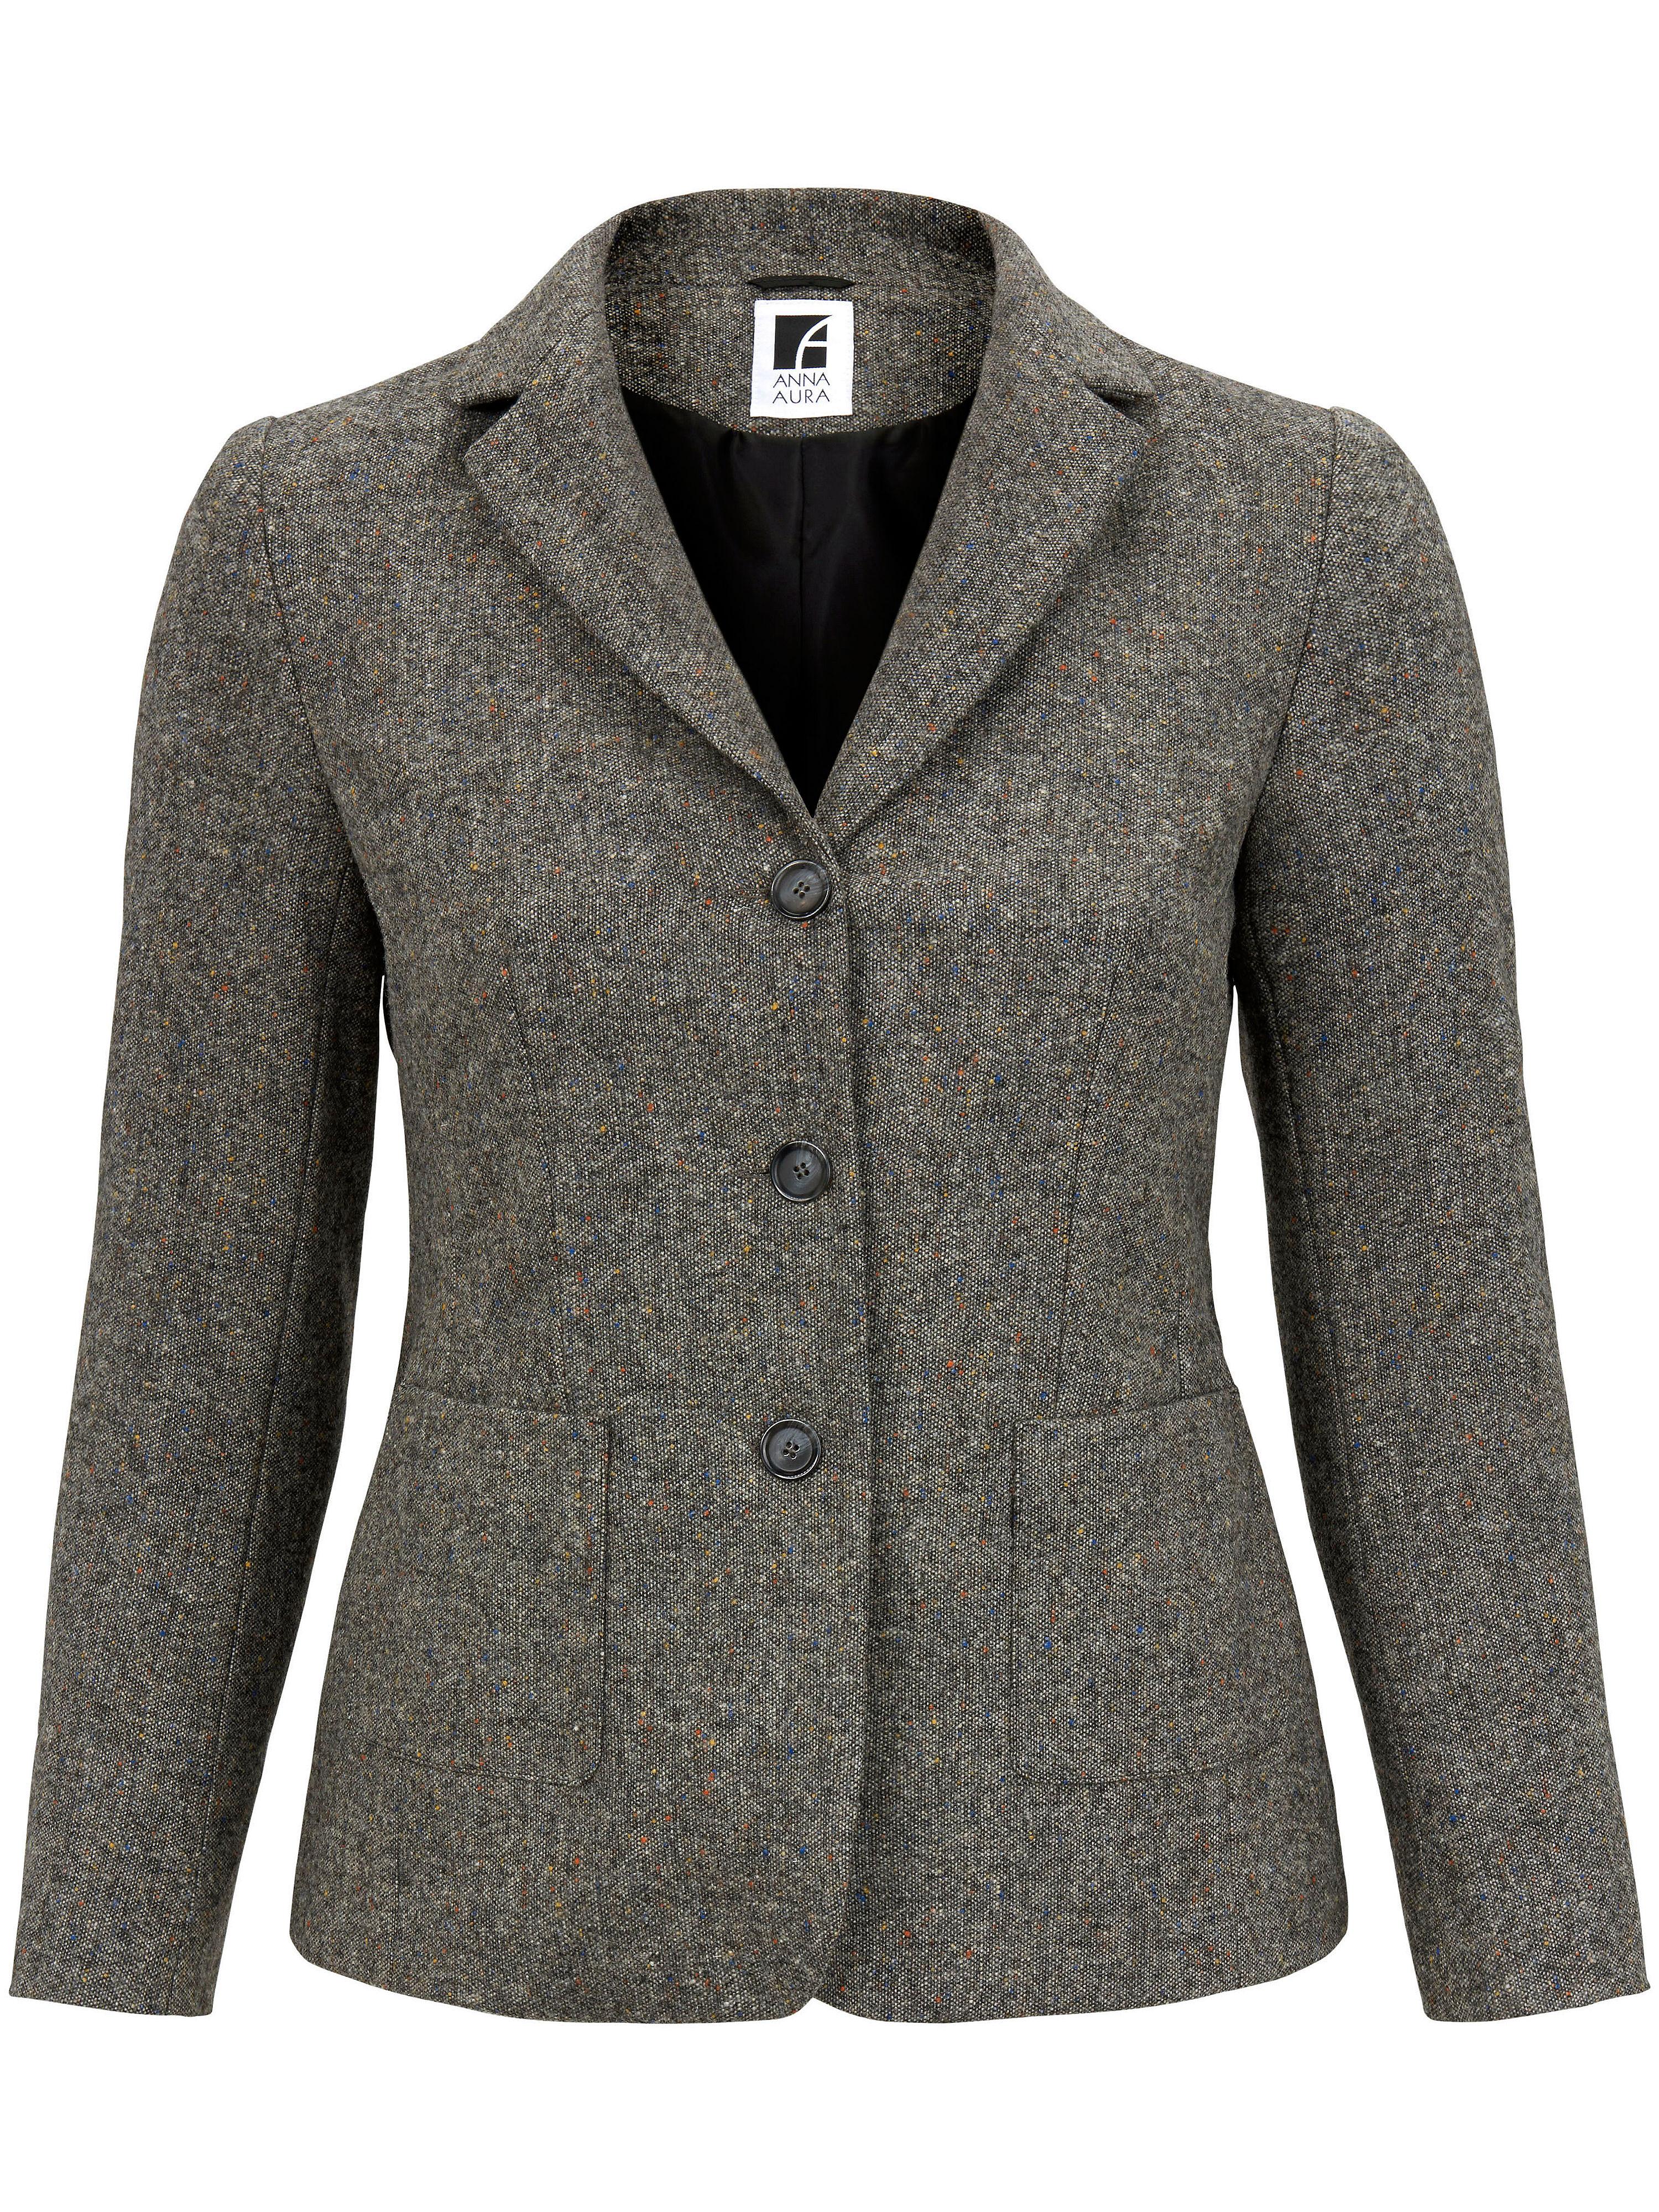 Image of   Blazer i 100% ren ny uld Fra Anna Aura sort